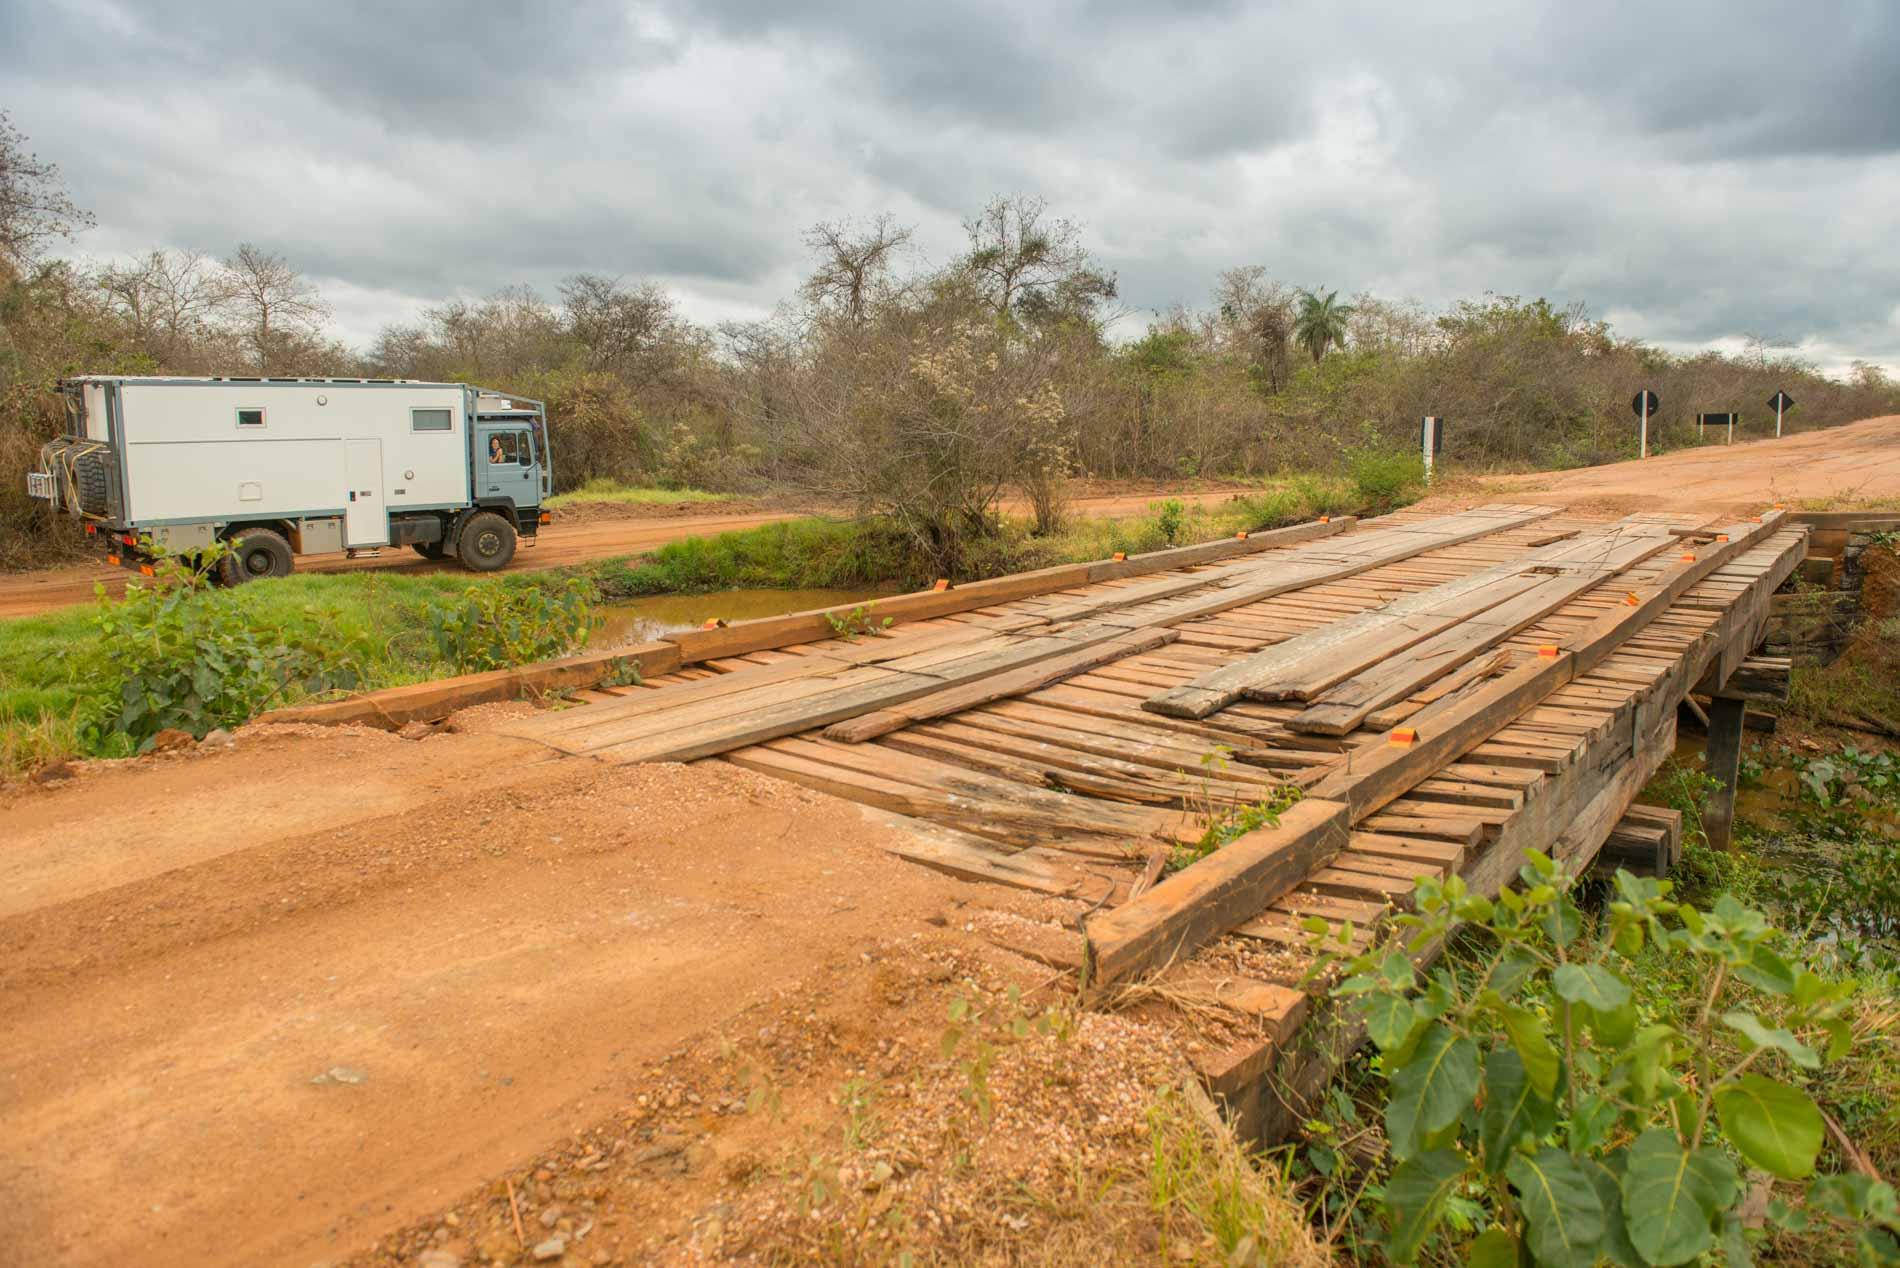 ponti-legno-pantanal-del-sud